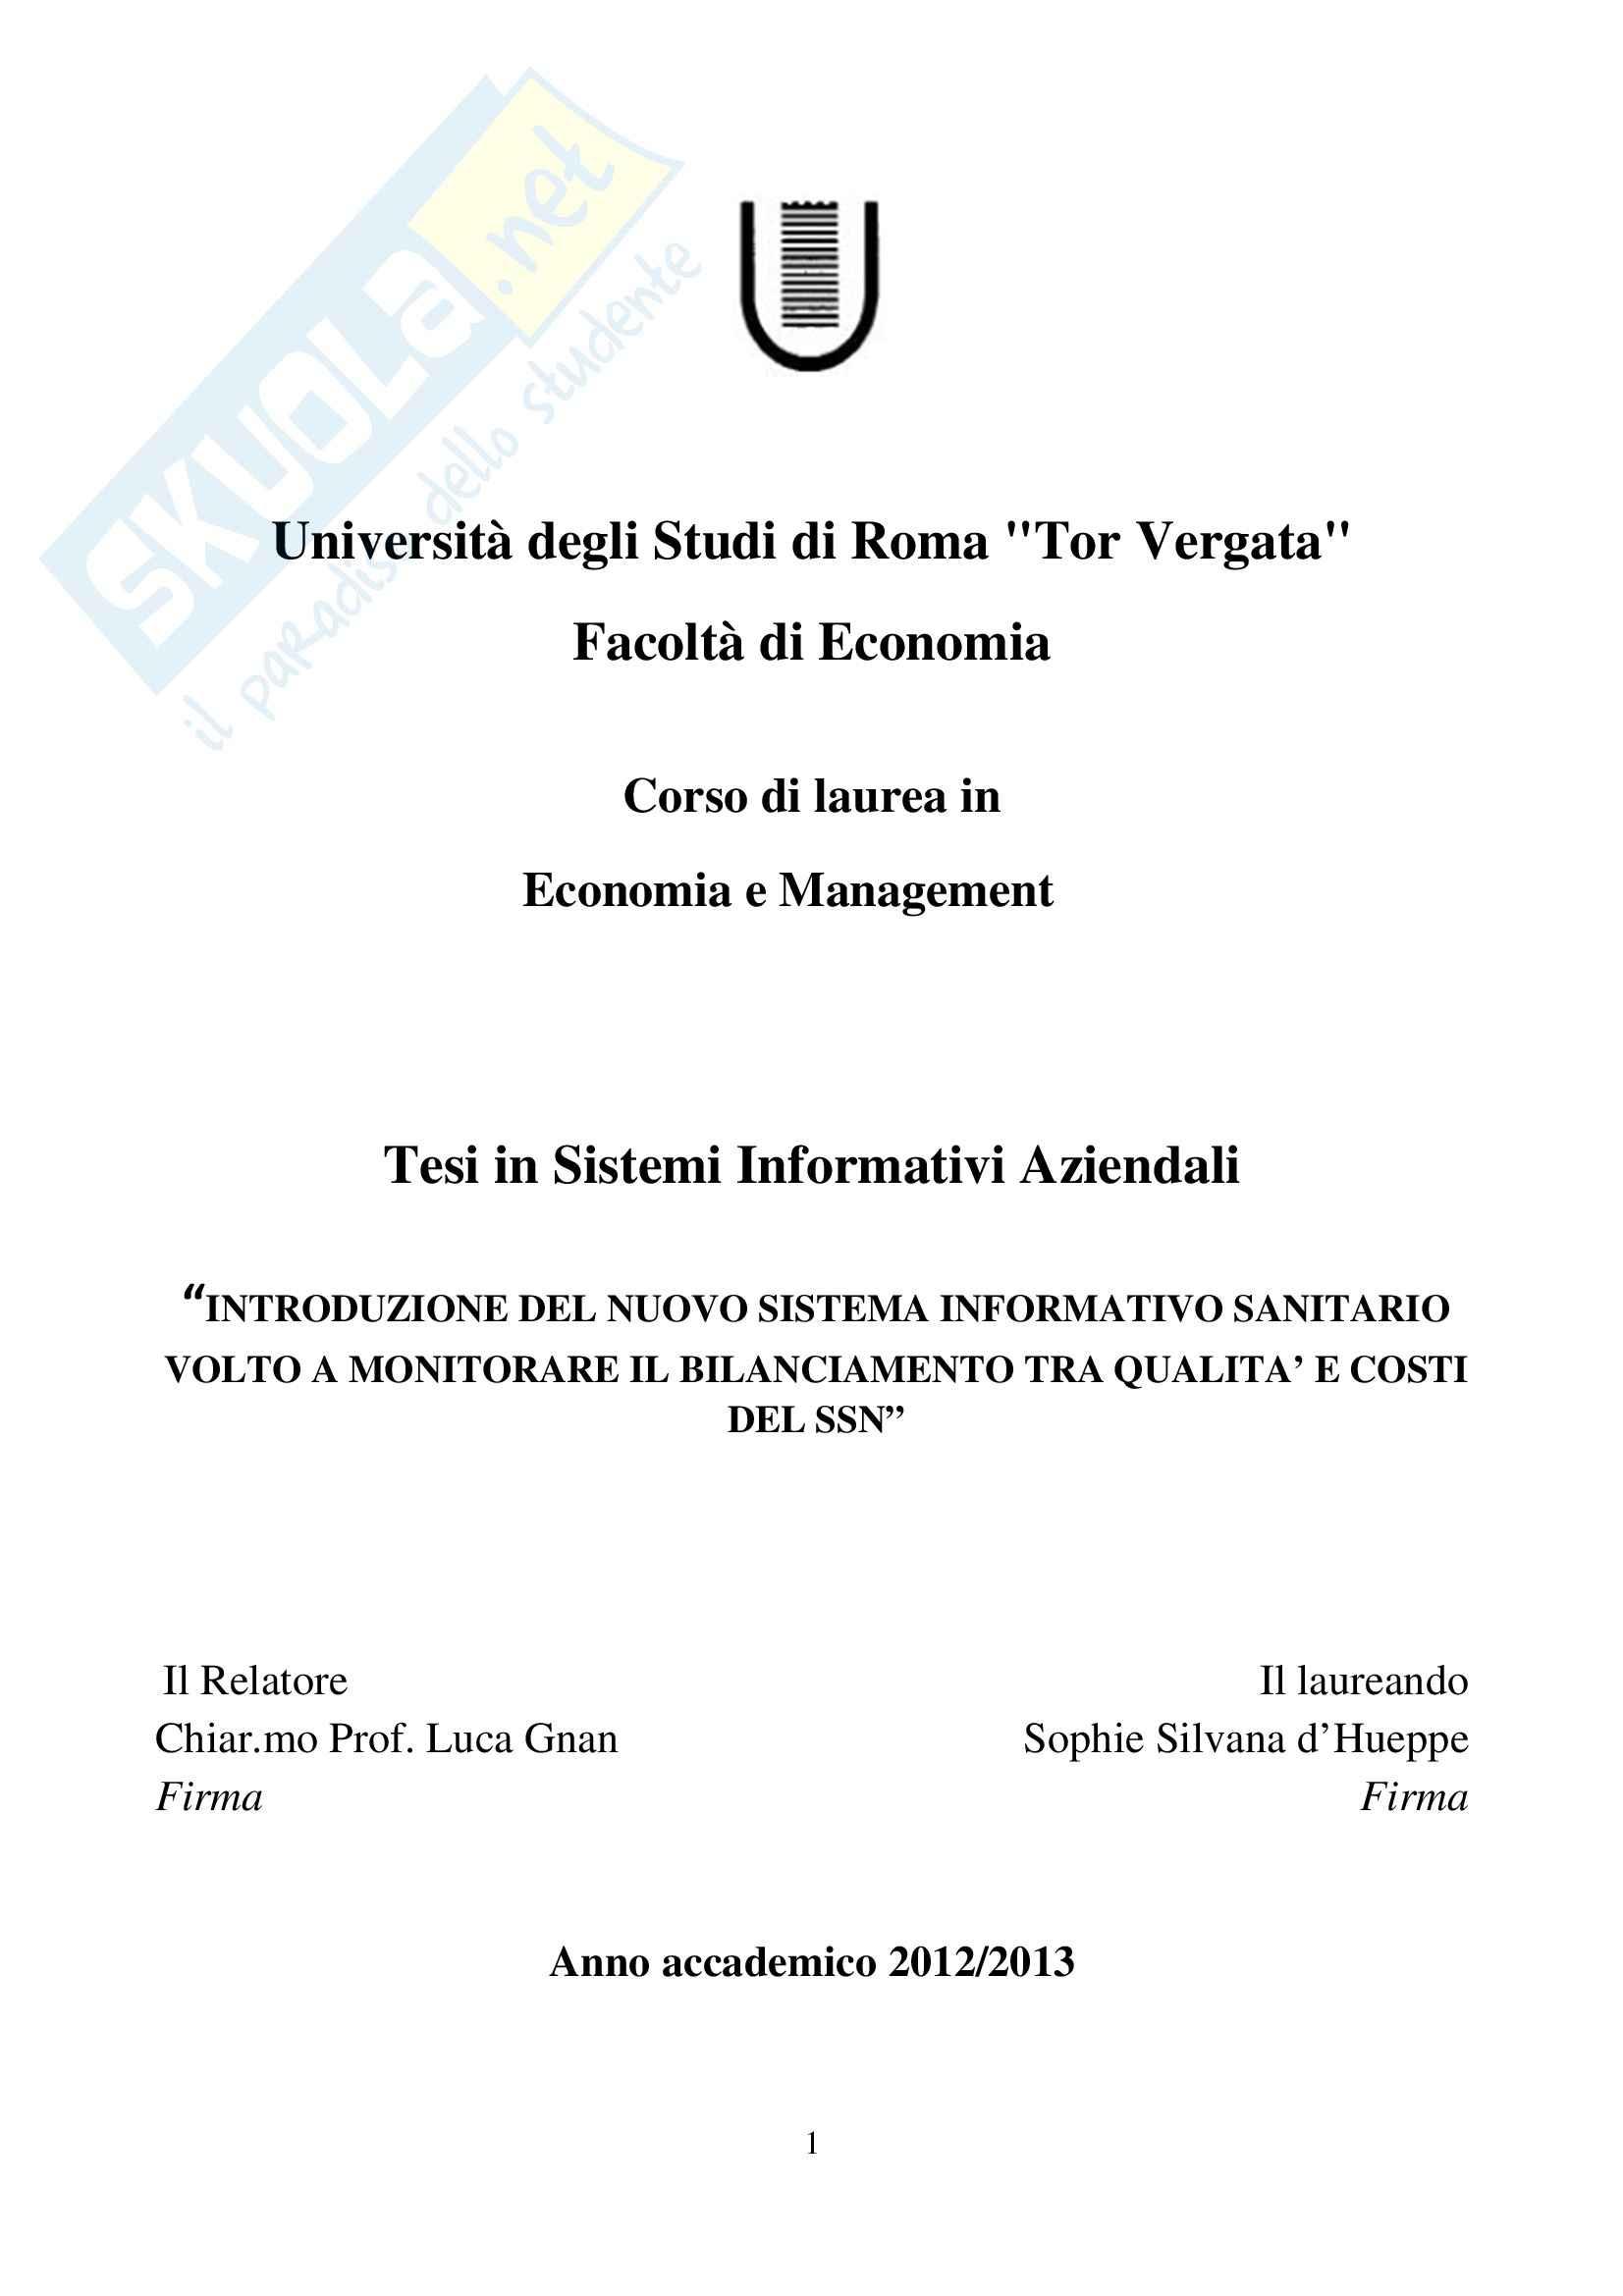 tesi L. Gnan Sistemi informativi